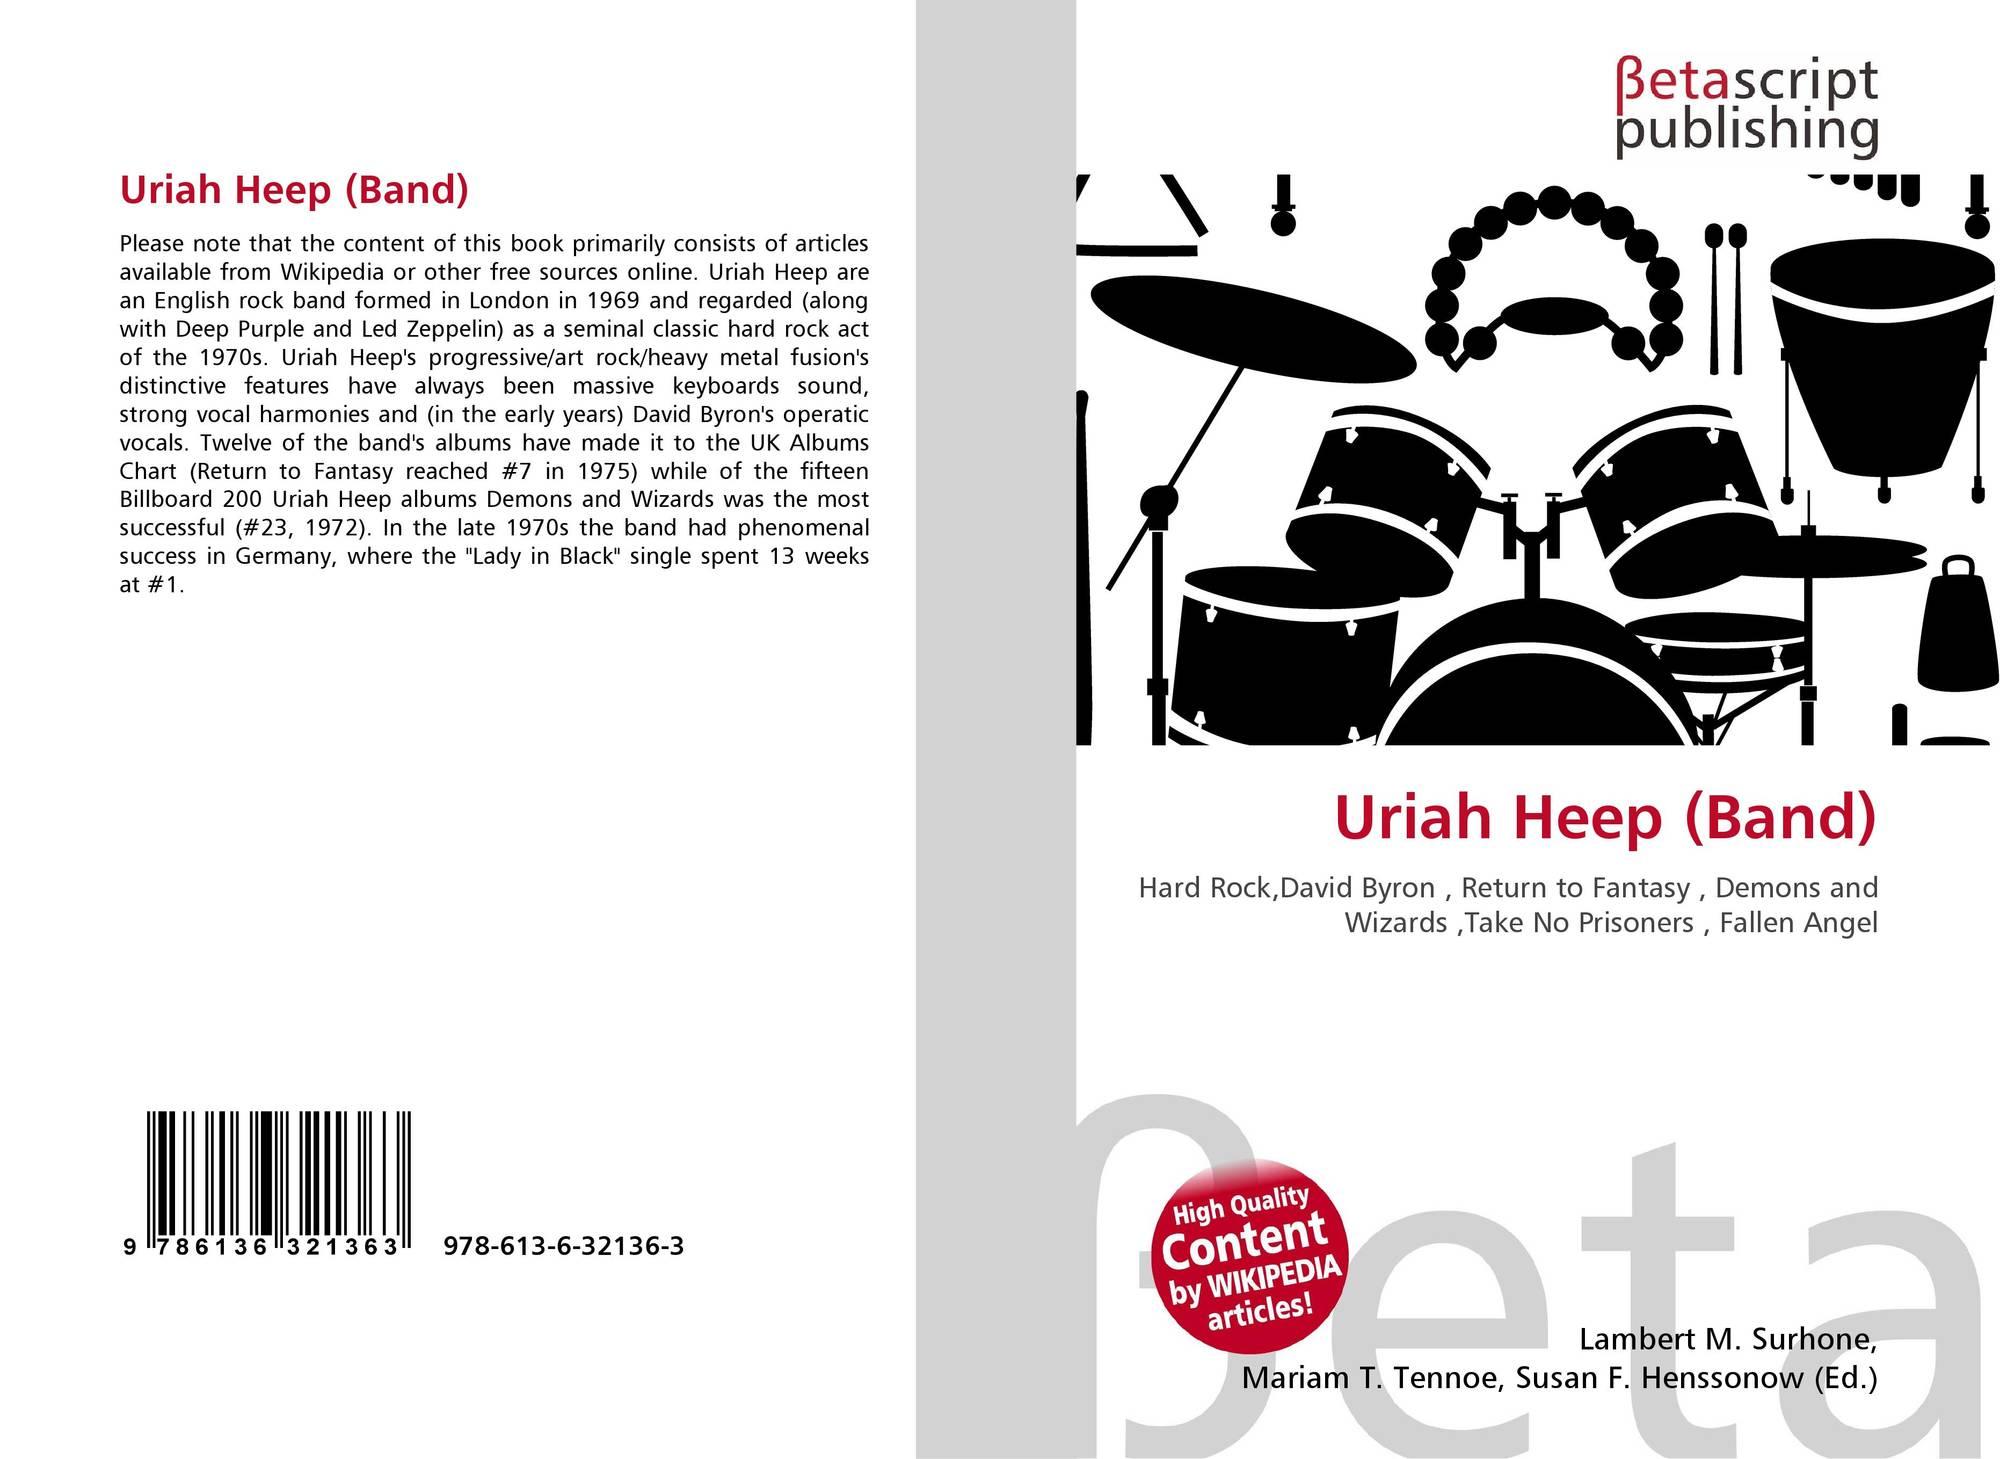 Uriah Heep Band 978 613 6 32136 3 613632136x 9786136321363